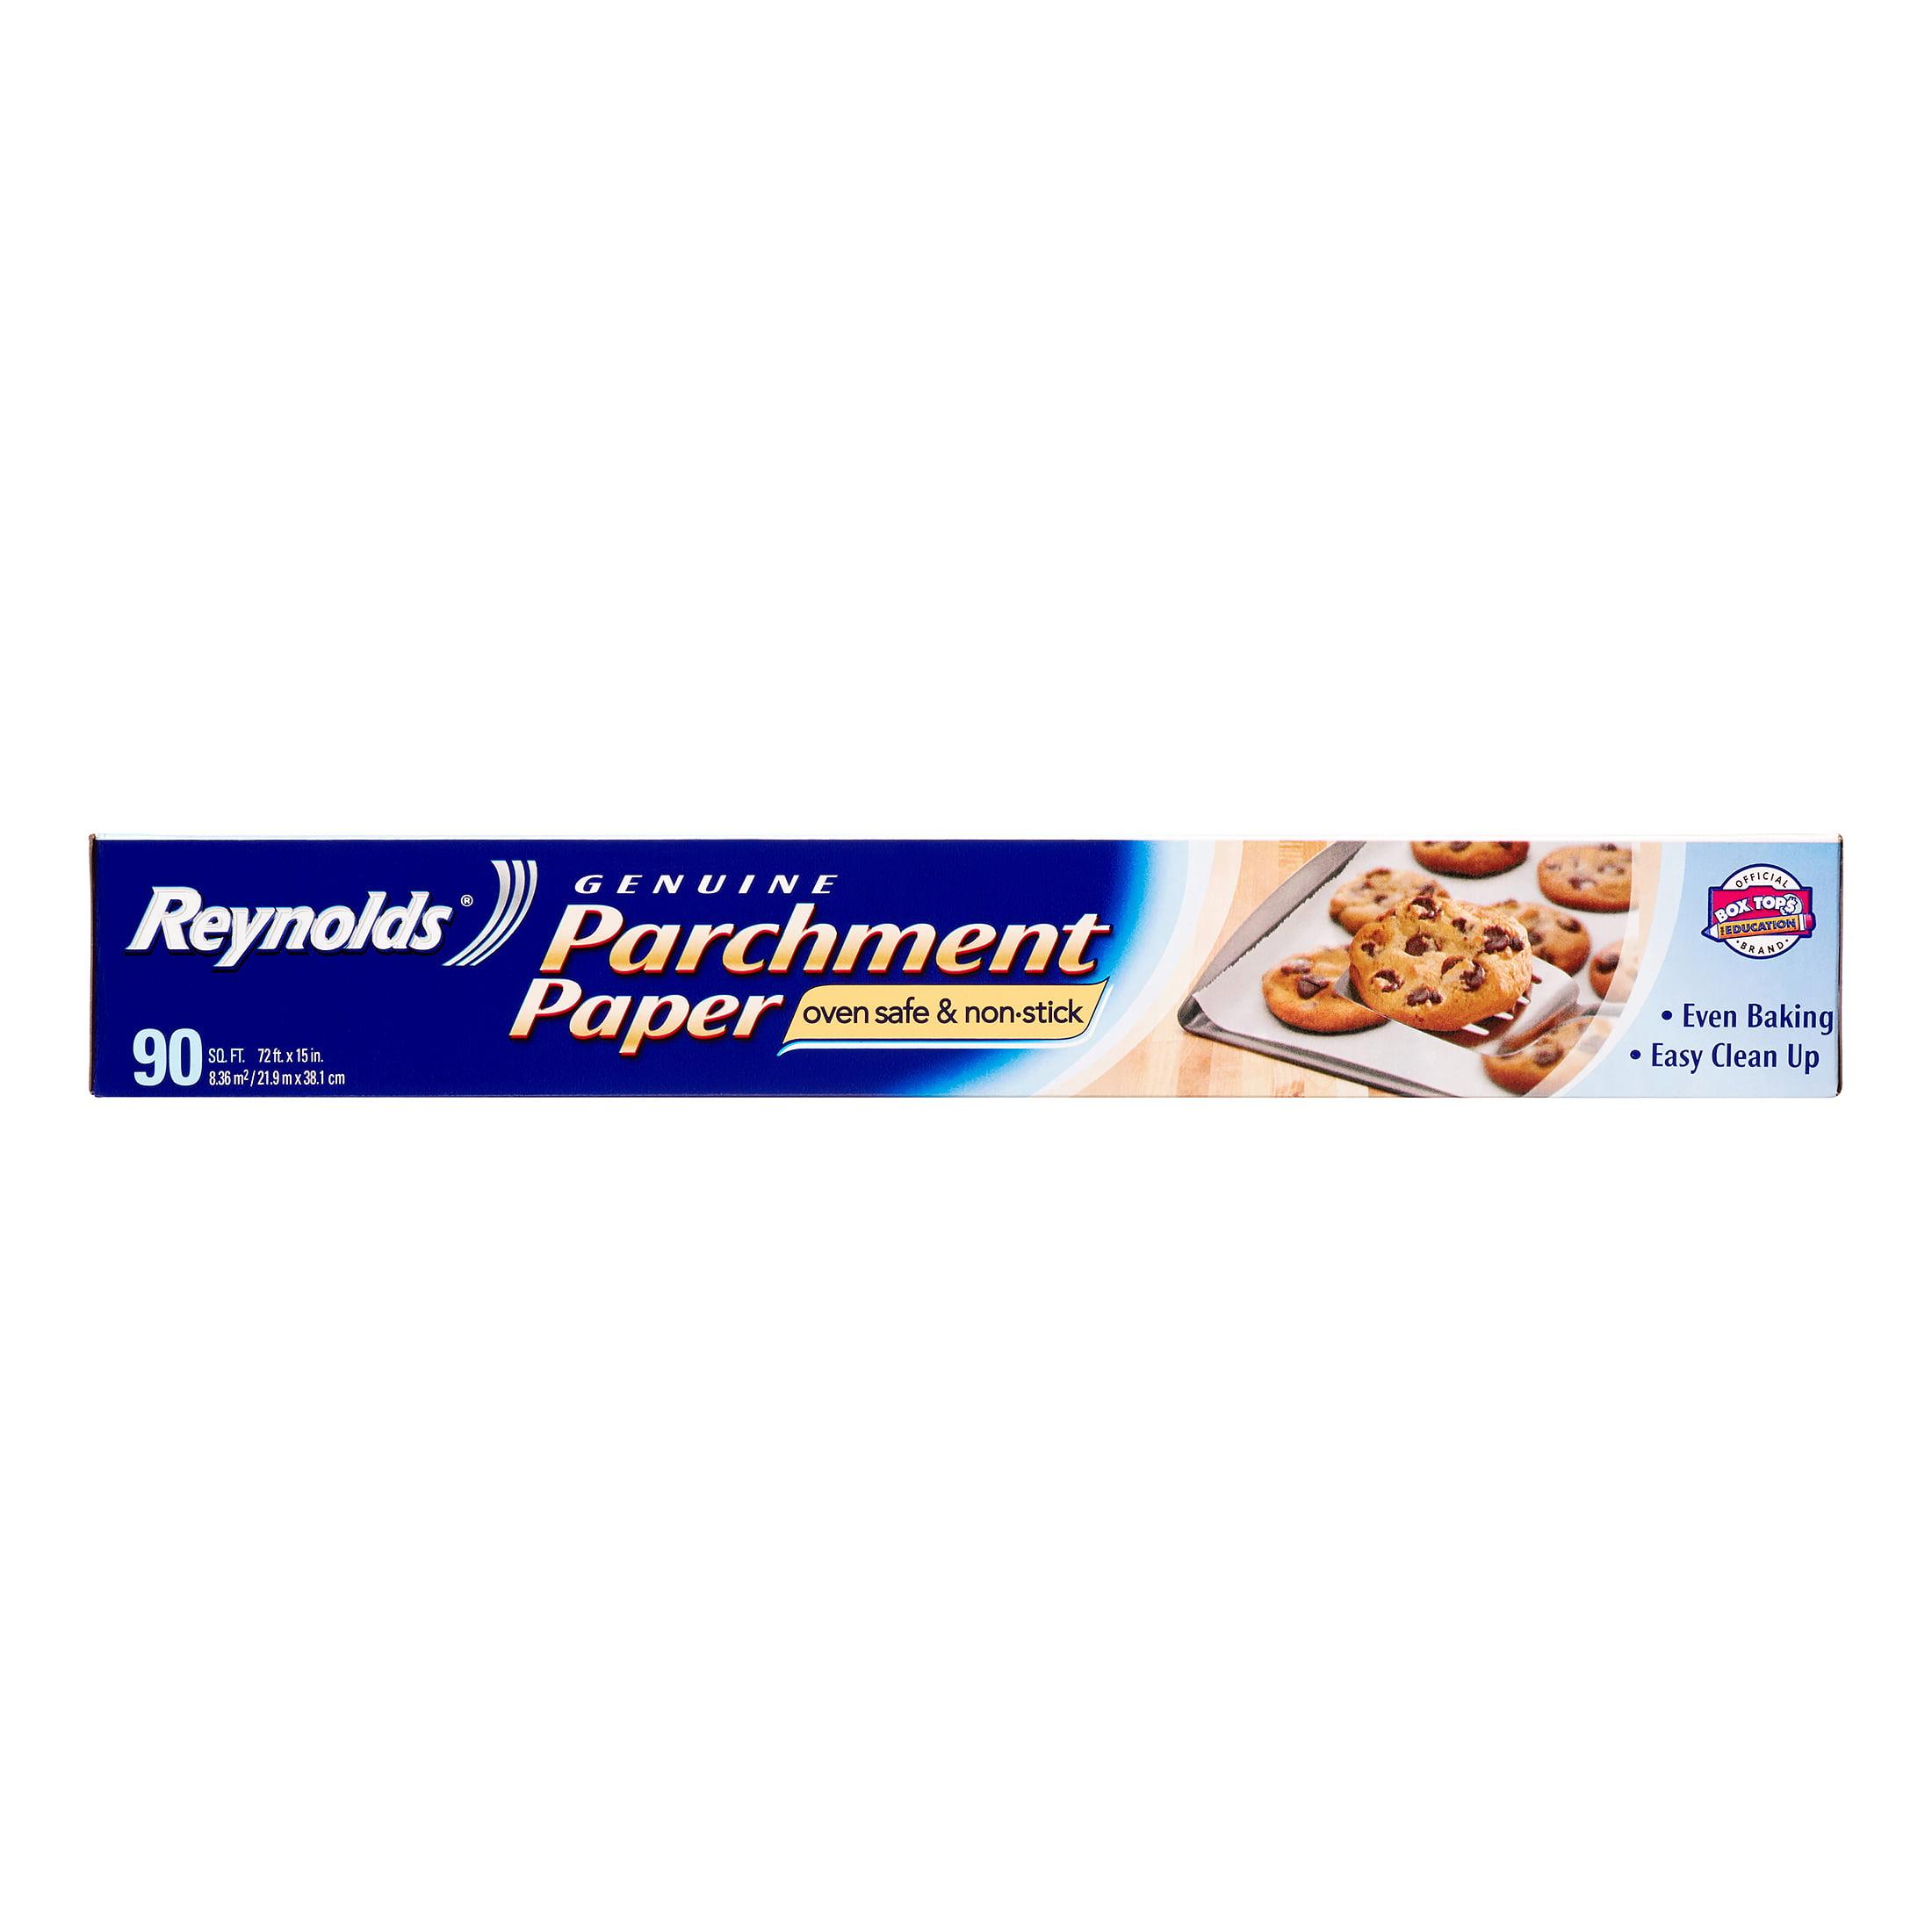 reynolds parchment paper Reynolds® parchment paper 2 cups flour 1 1/4 cups sugar 1/2 teaspoon  baking soda 1/2 teaspoon ground cinnamon 1/4 teaspoon salt 3/4 cup butter or .